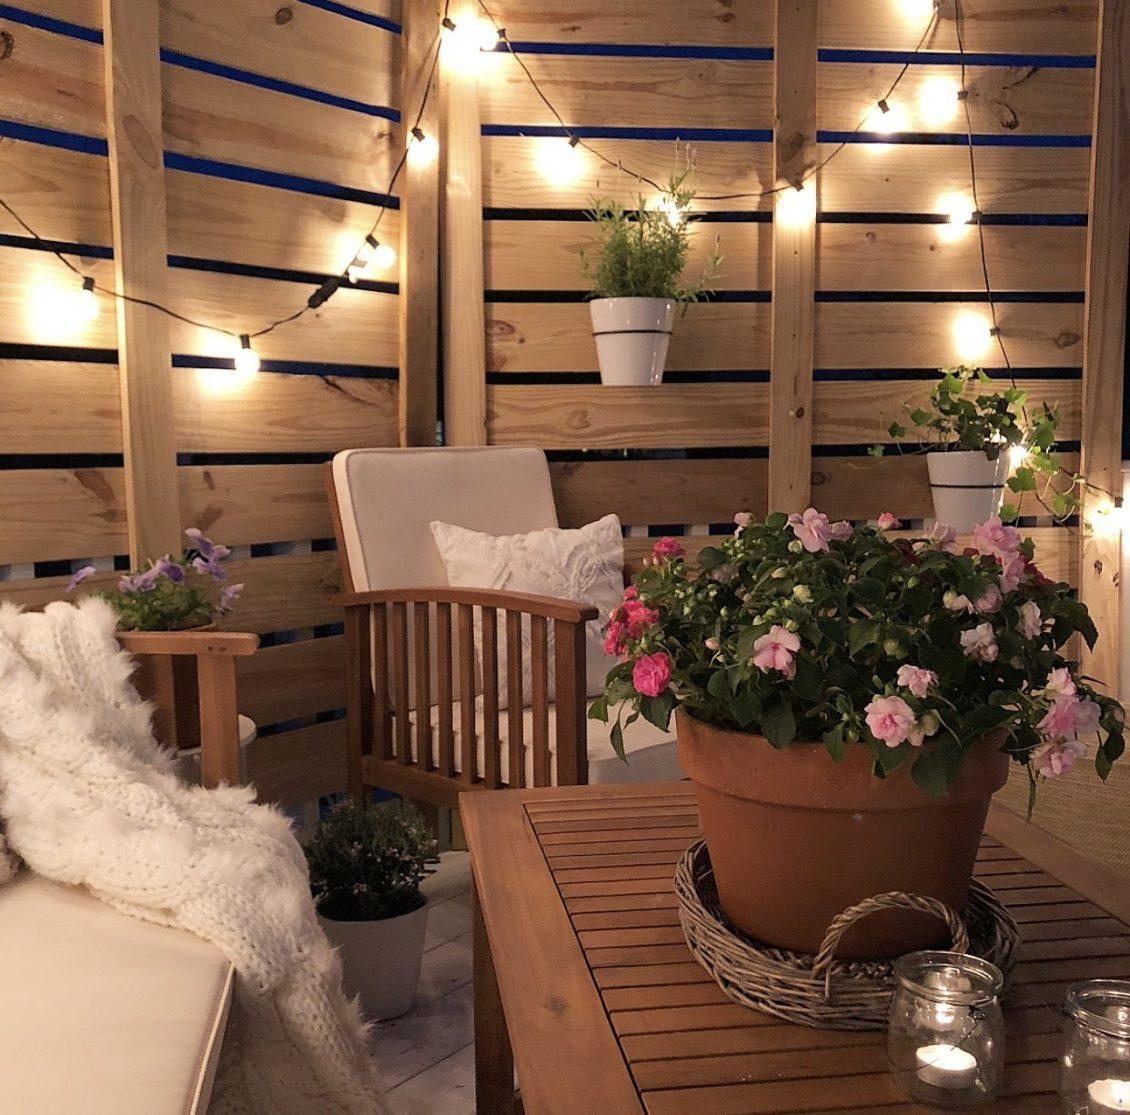 8 Tips To Become The Artist Of Your Own Garden - Image Via acarriedaffairblog.com - Deck Makeover – Part I